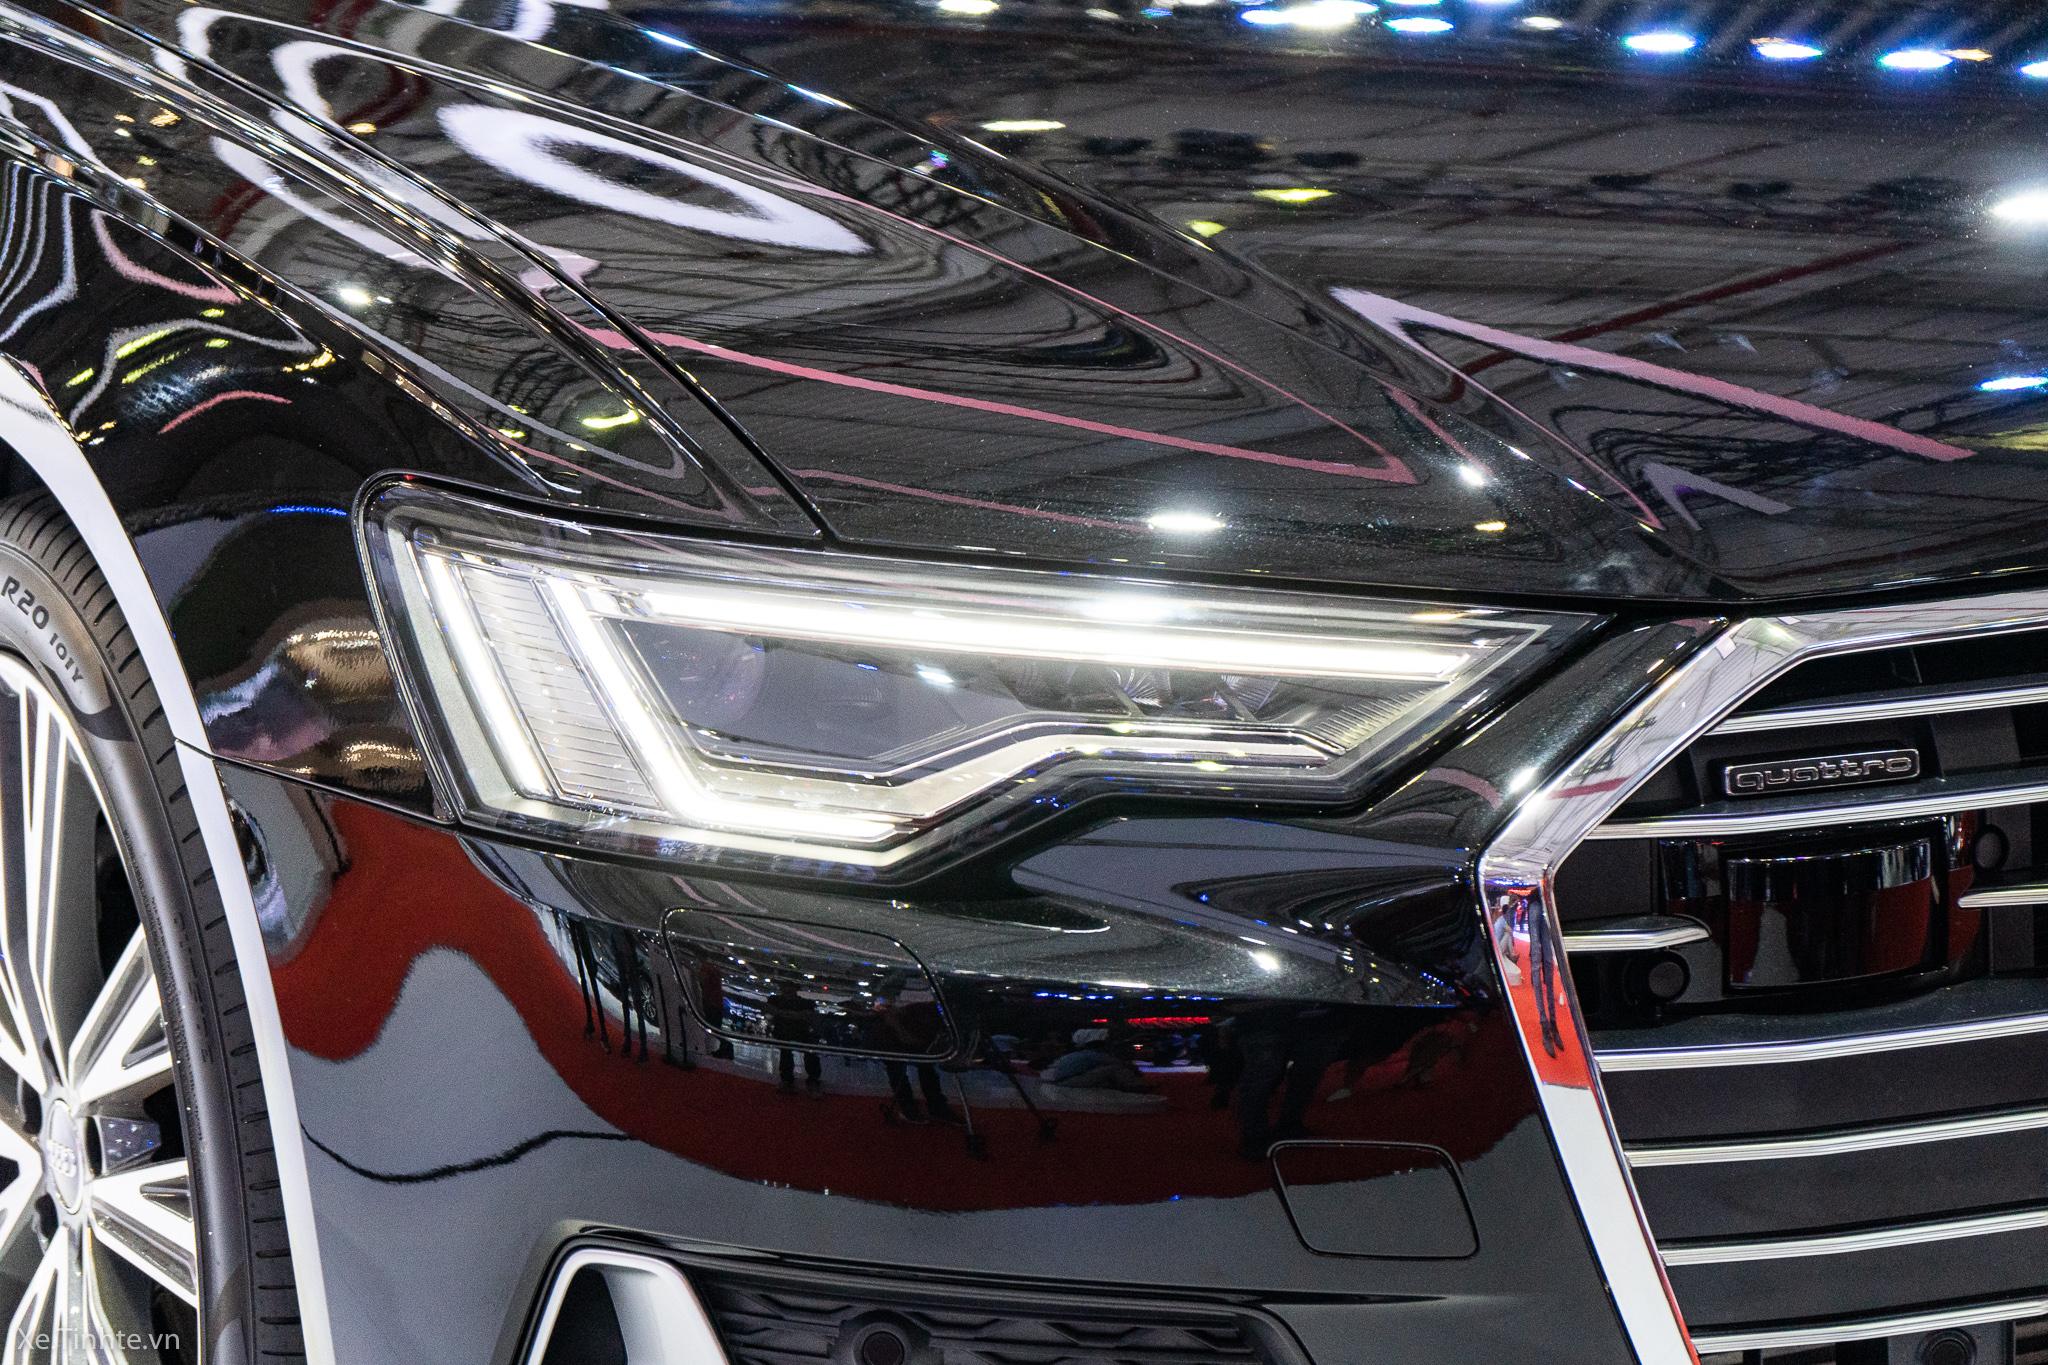 VMS19_Audi_A6-05819.jpg